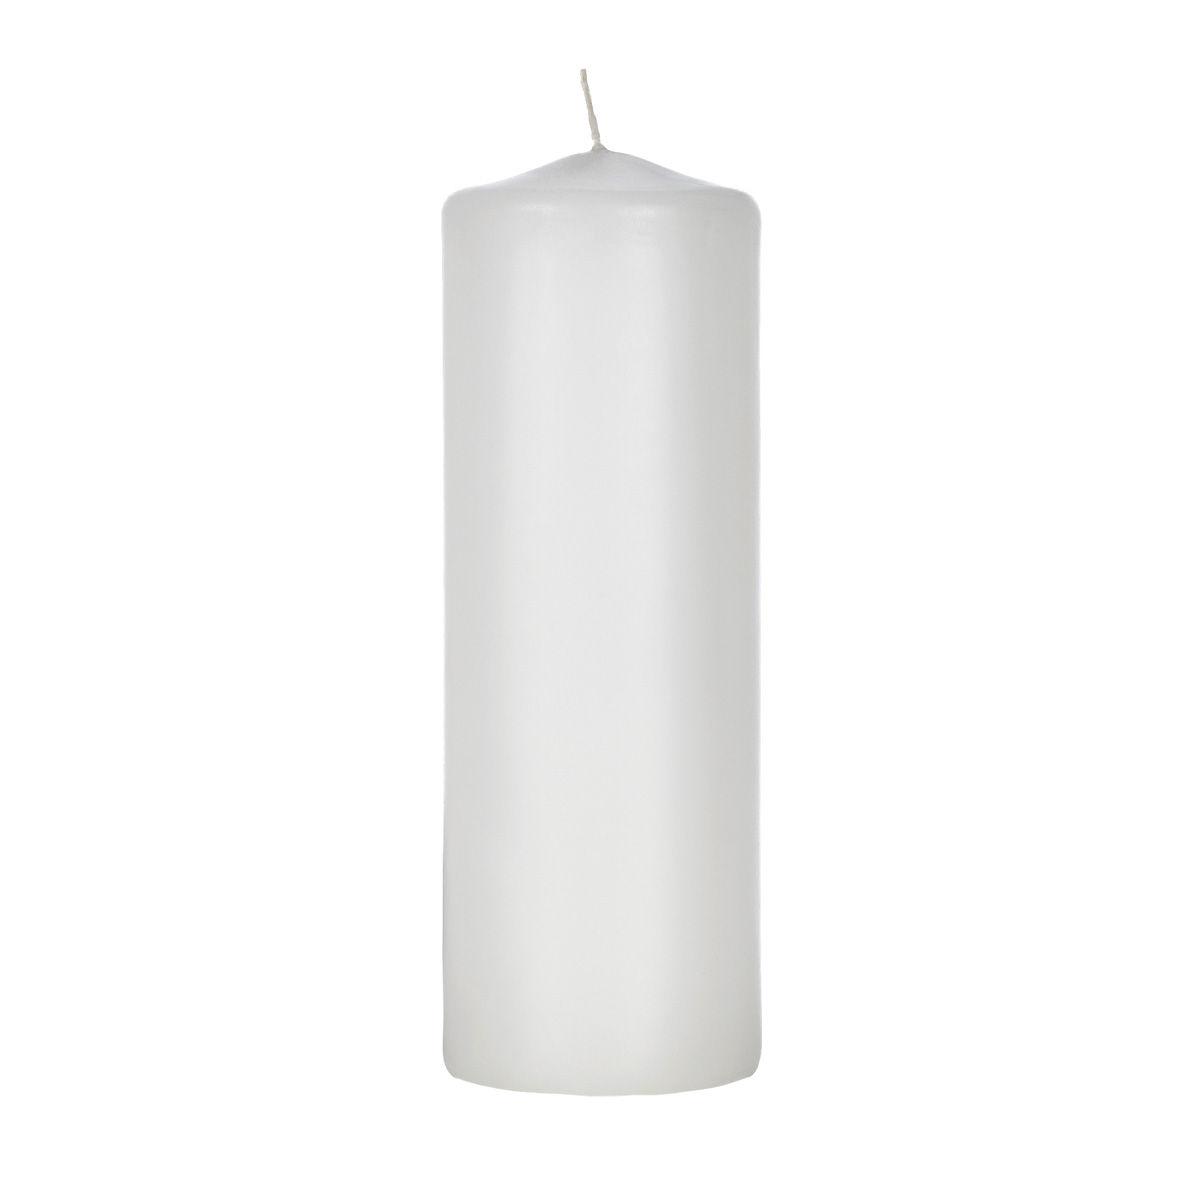 2x6 White Pillar Candle